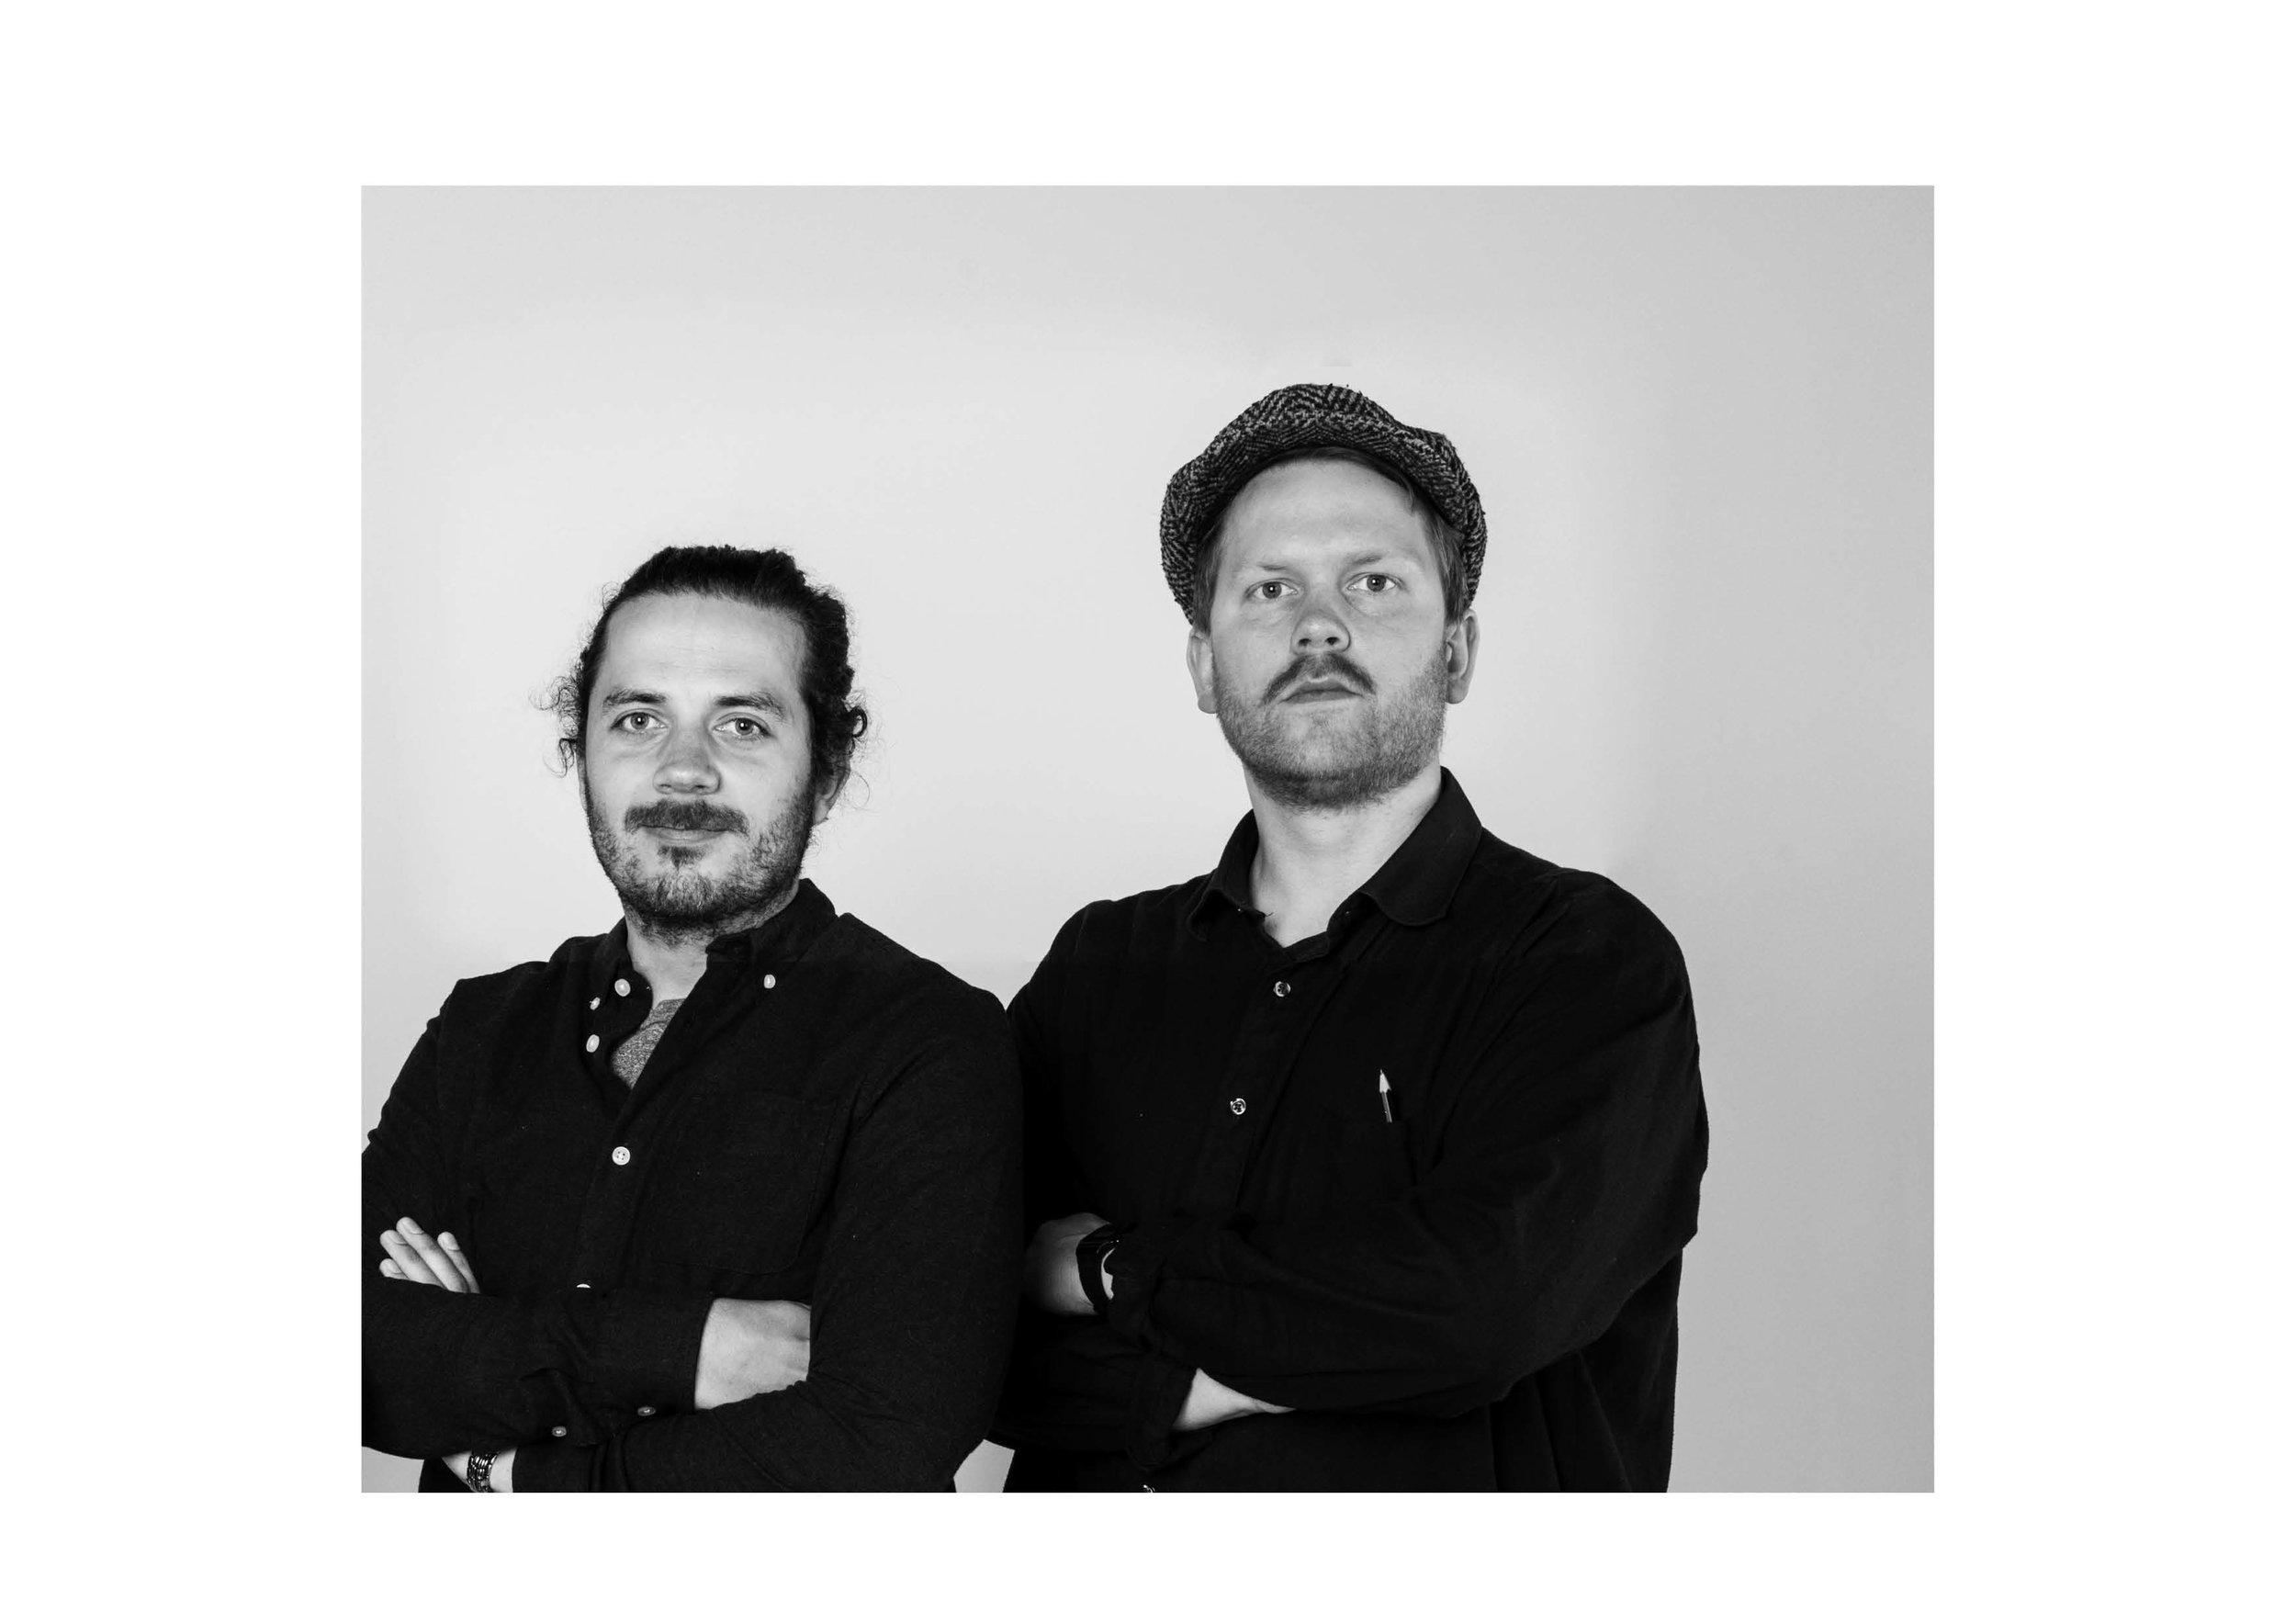 Henrik Waarum & Åsmund Engesland  Contact:info@osloform.no